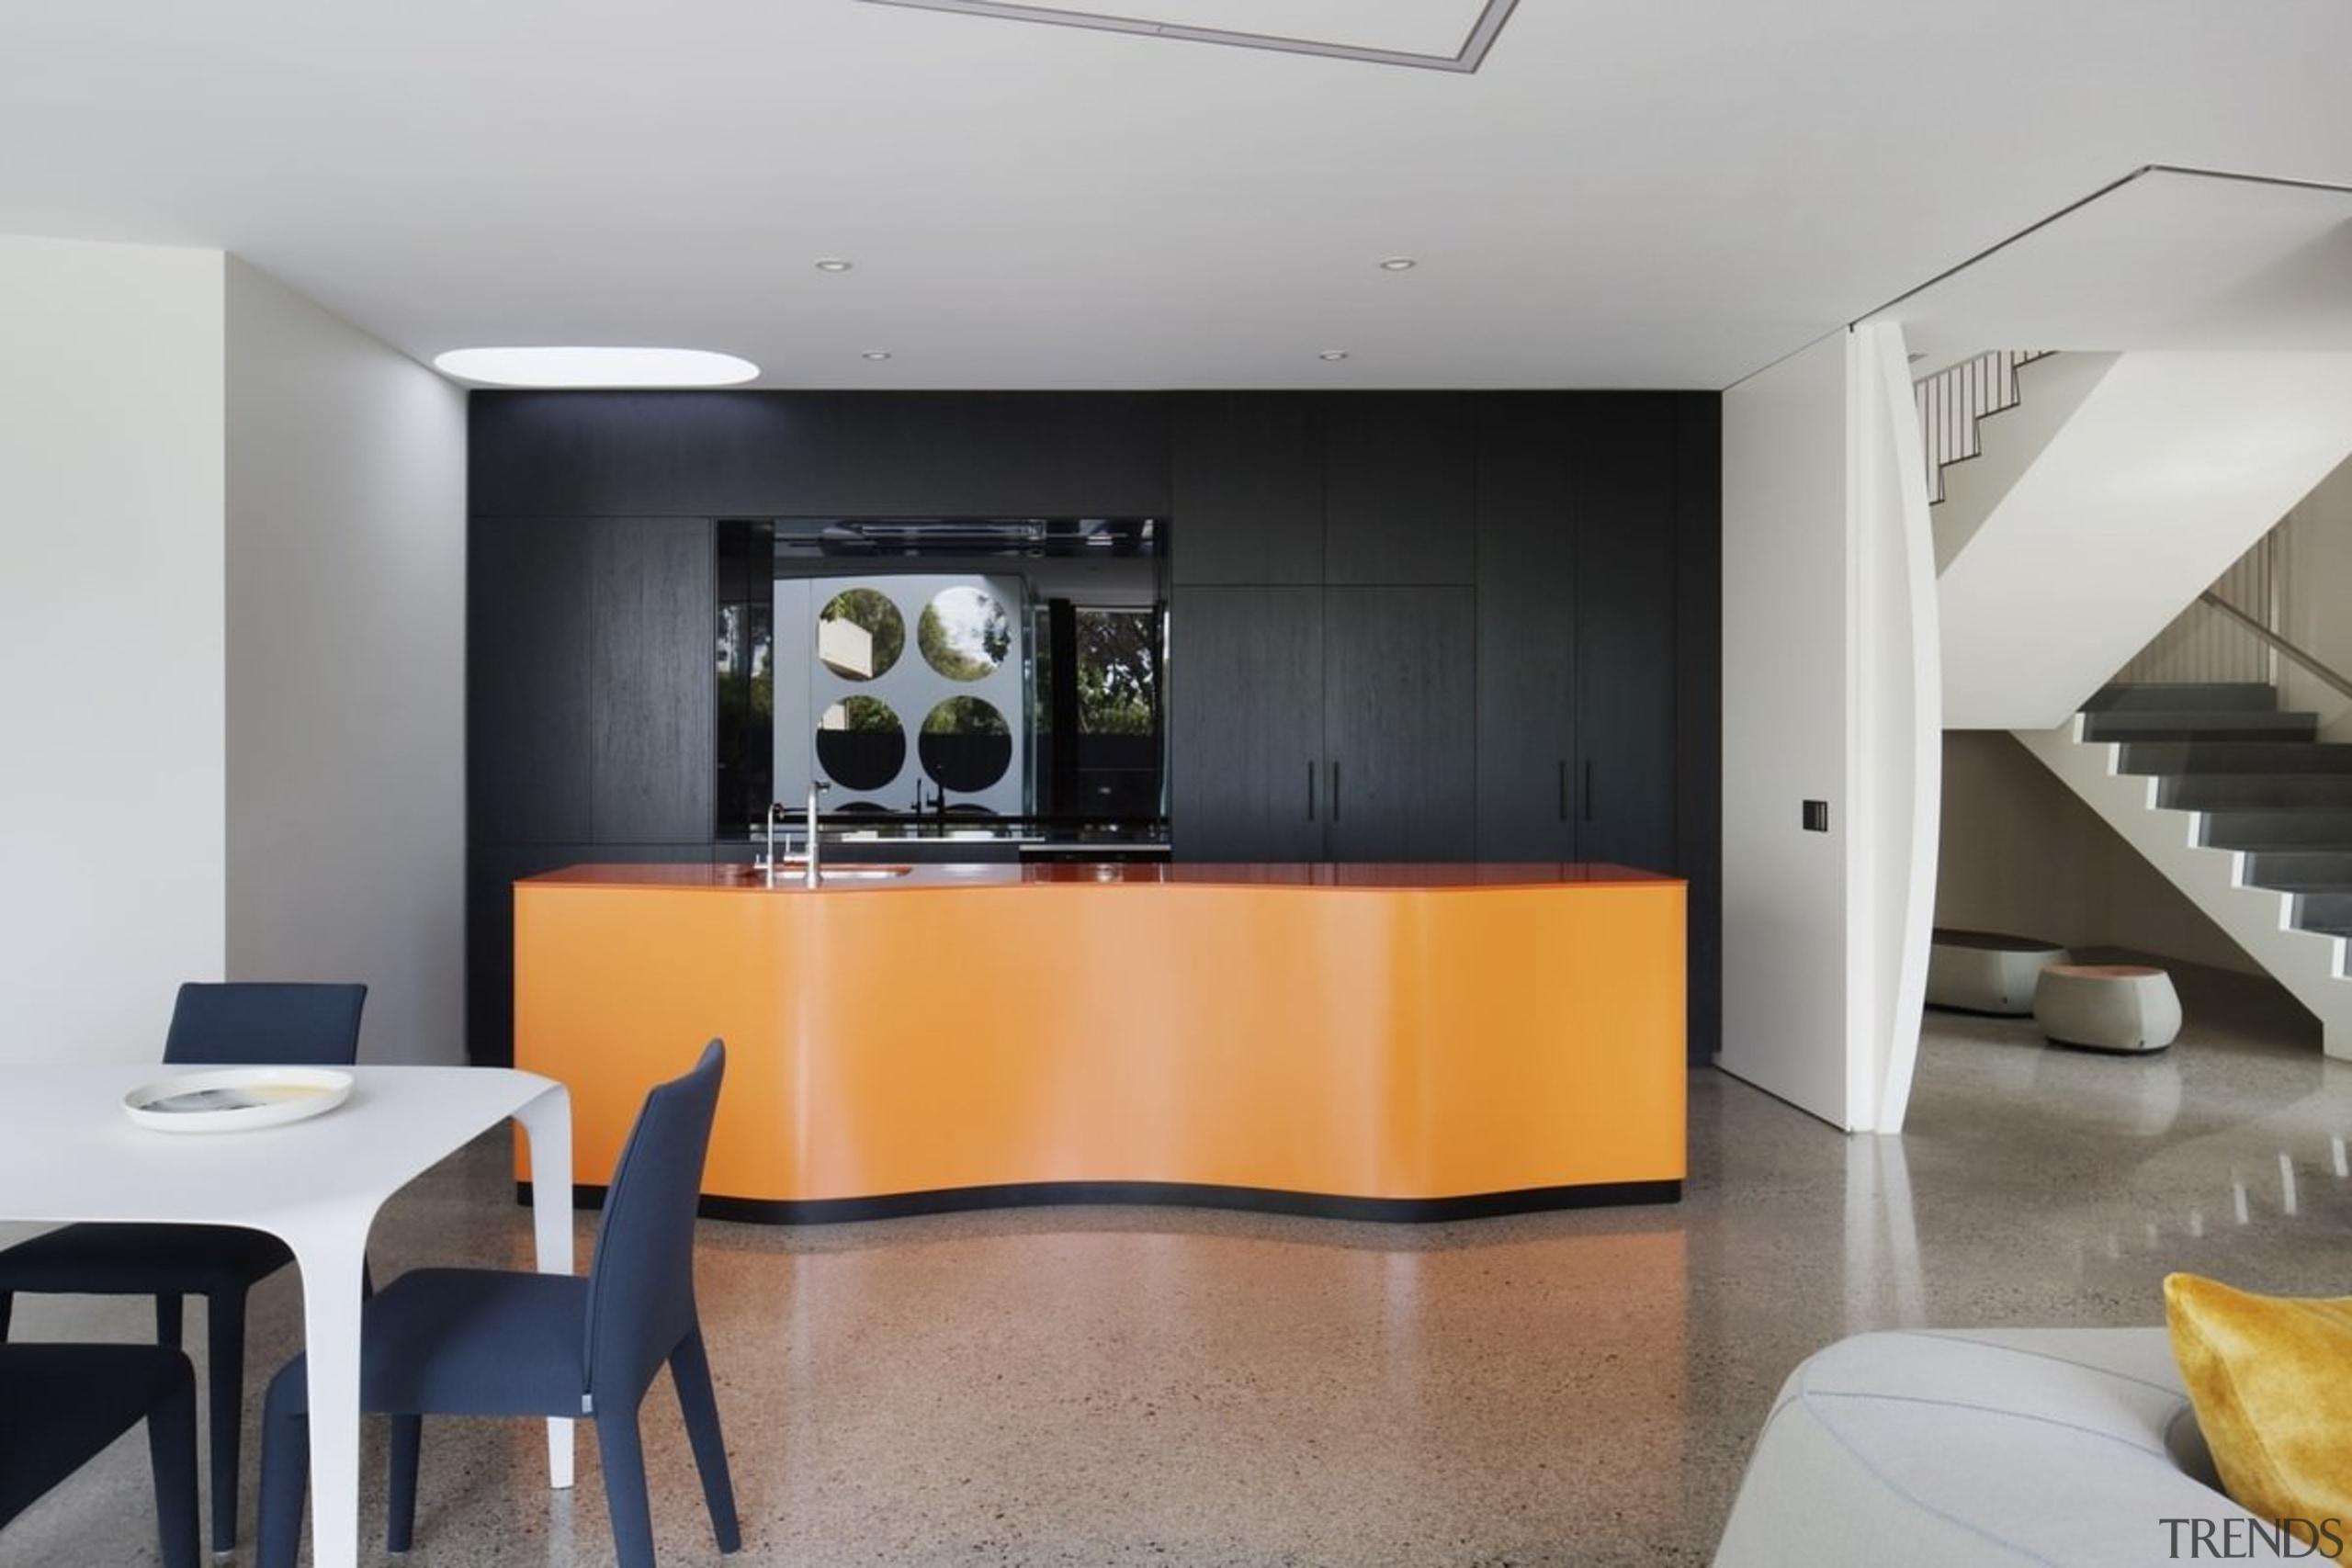 Architect: Gray PuksandPhotography by Shannon McGrath architecture, interior design, product design, property, real estate, gray